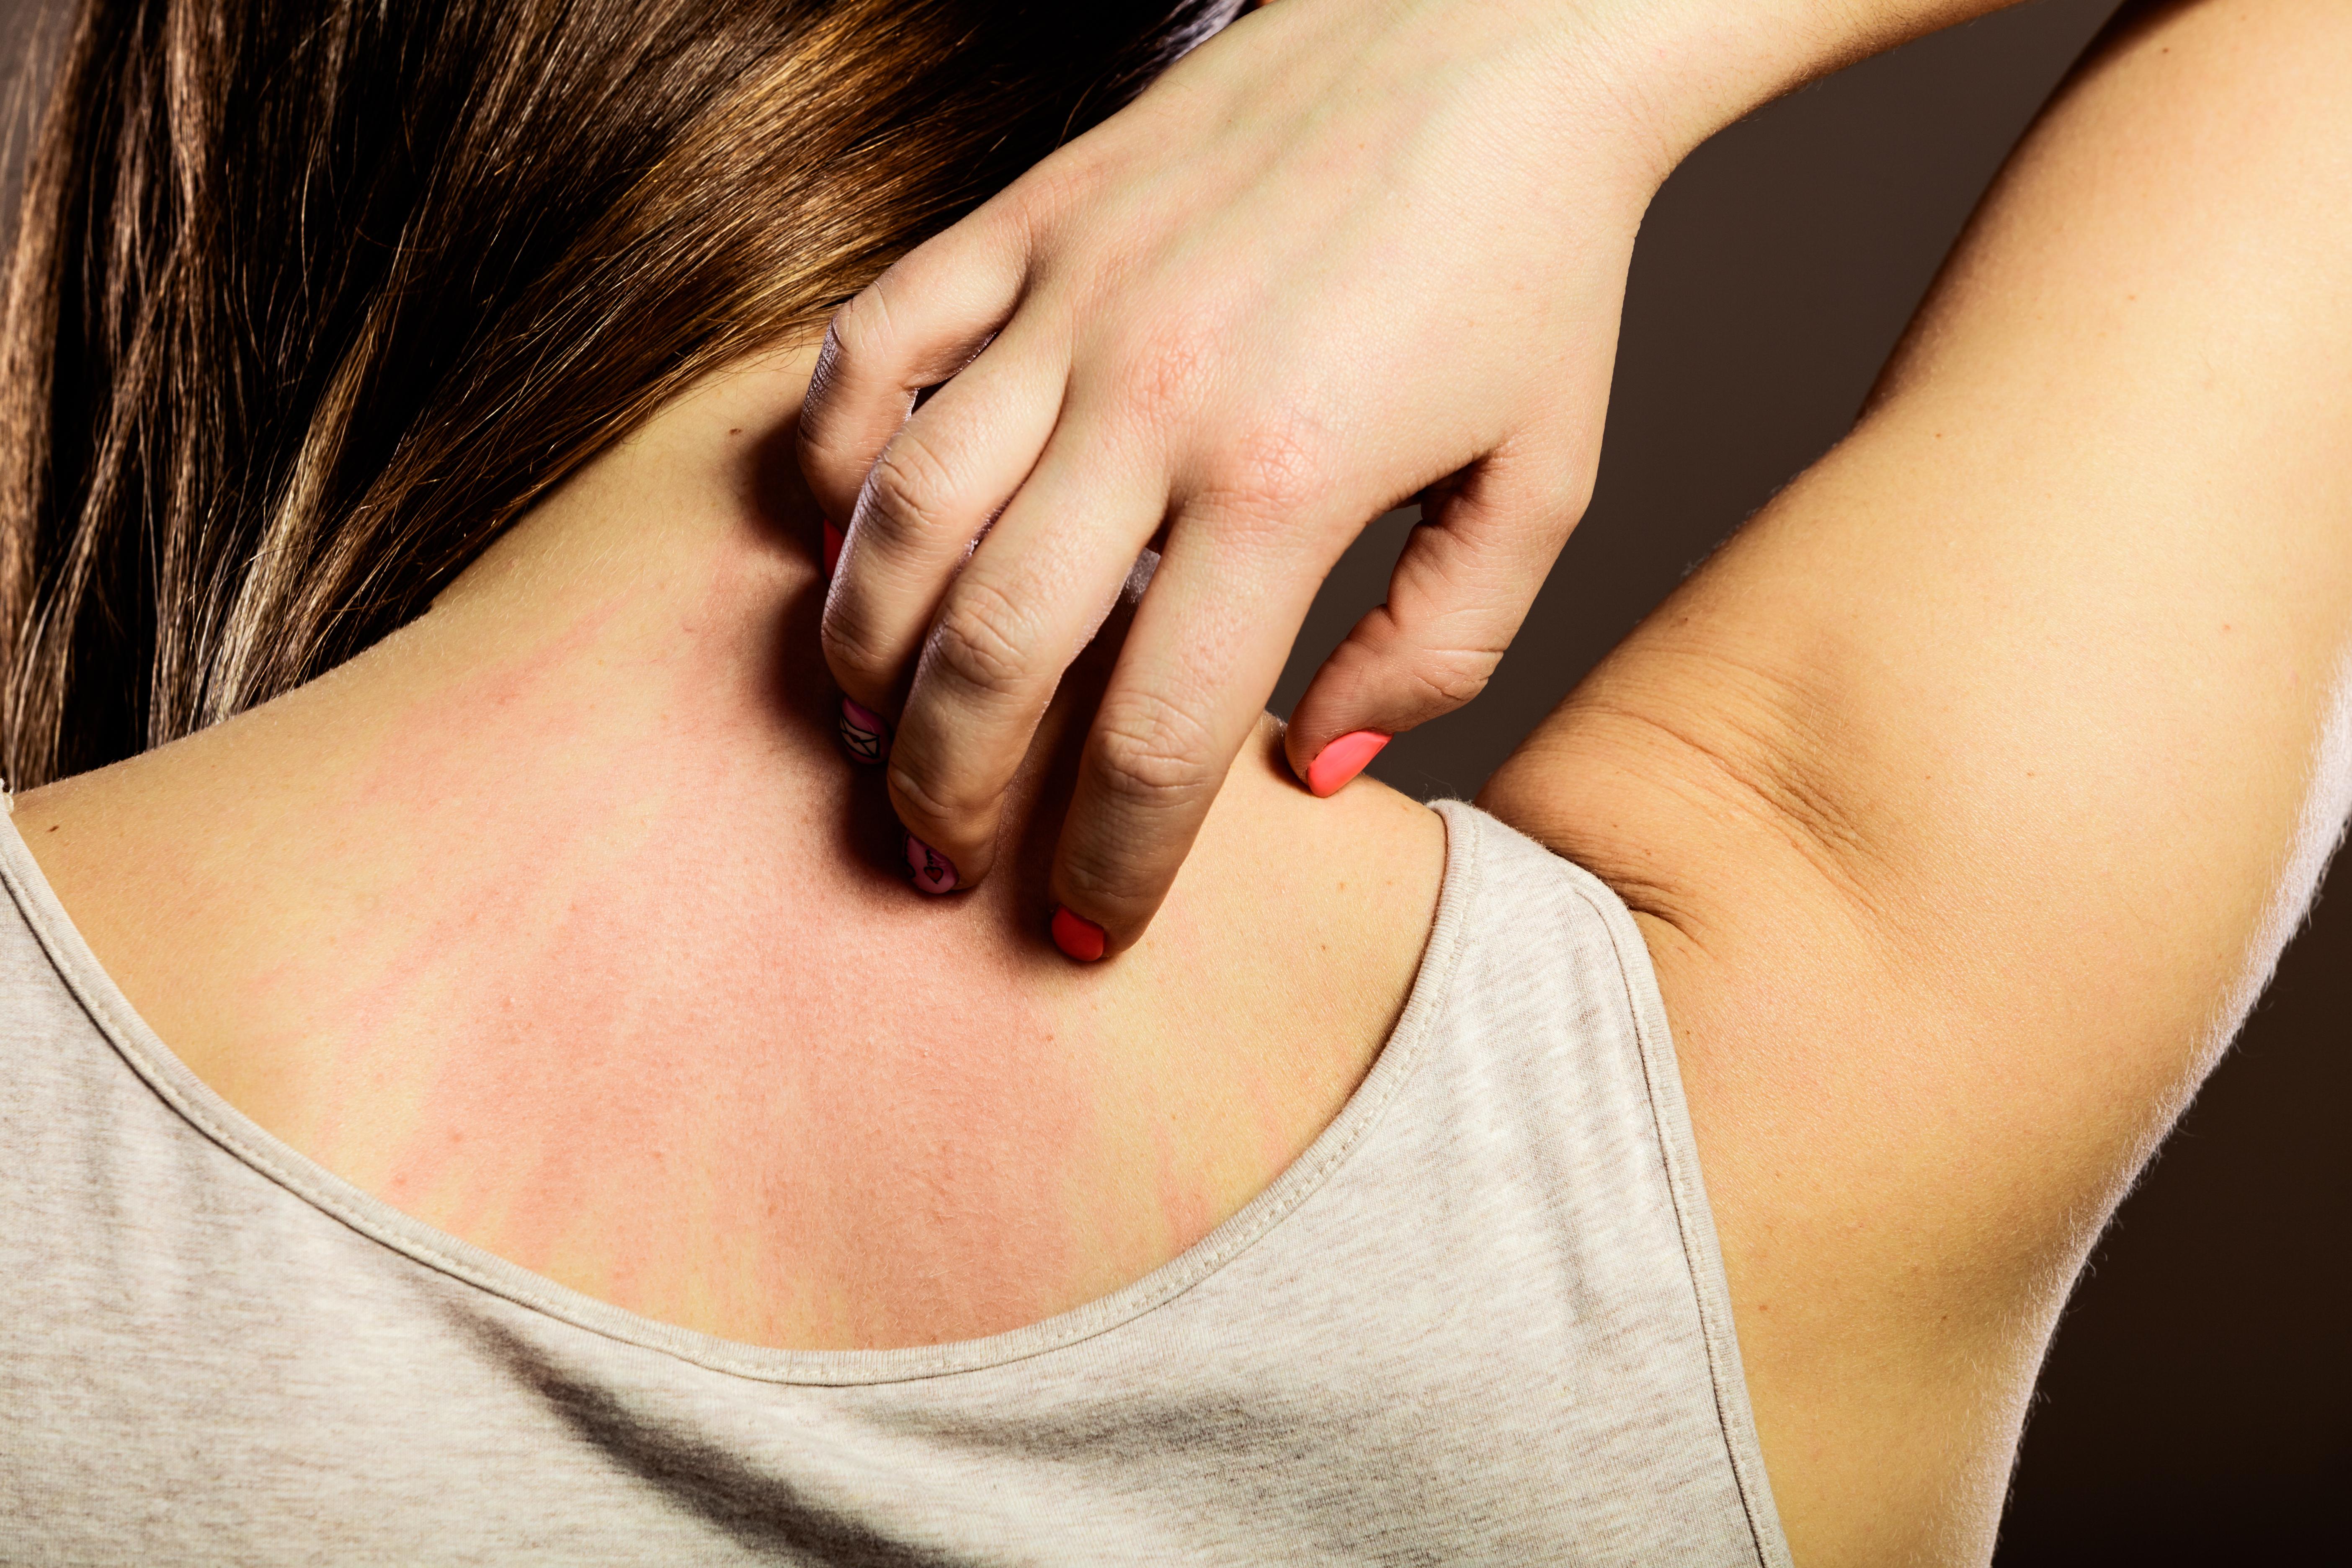 La dermatitis atópica ¿Síntomas? ¿Causas?